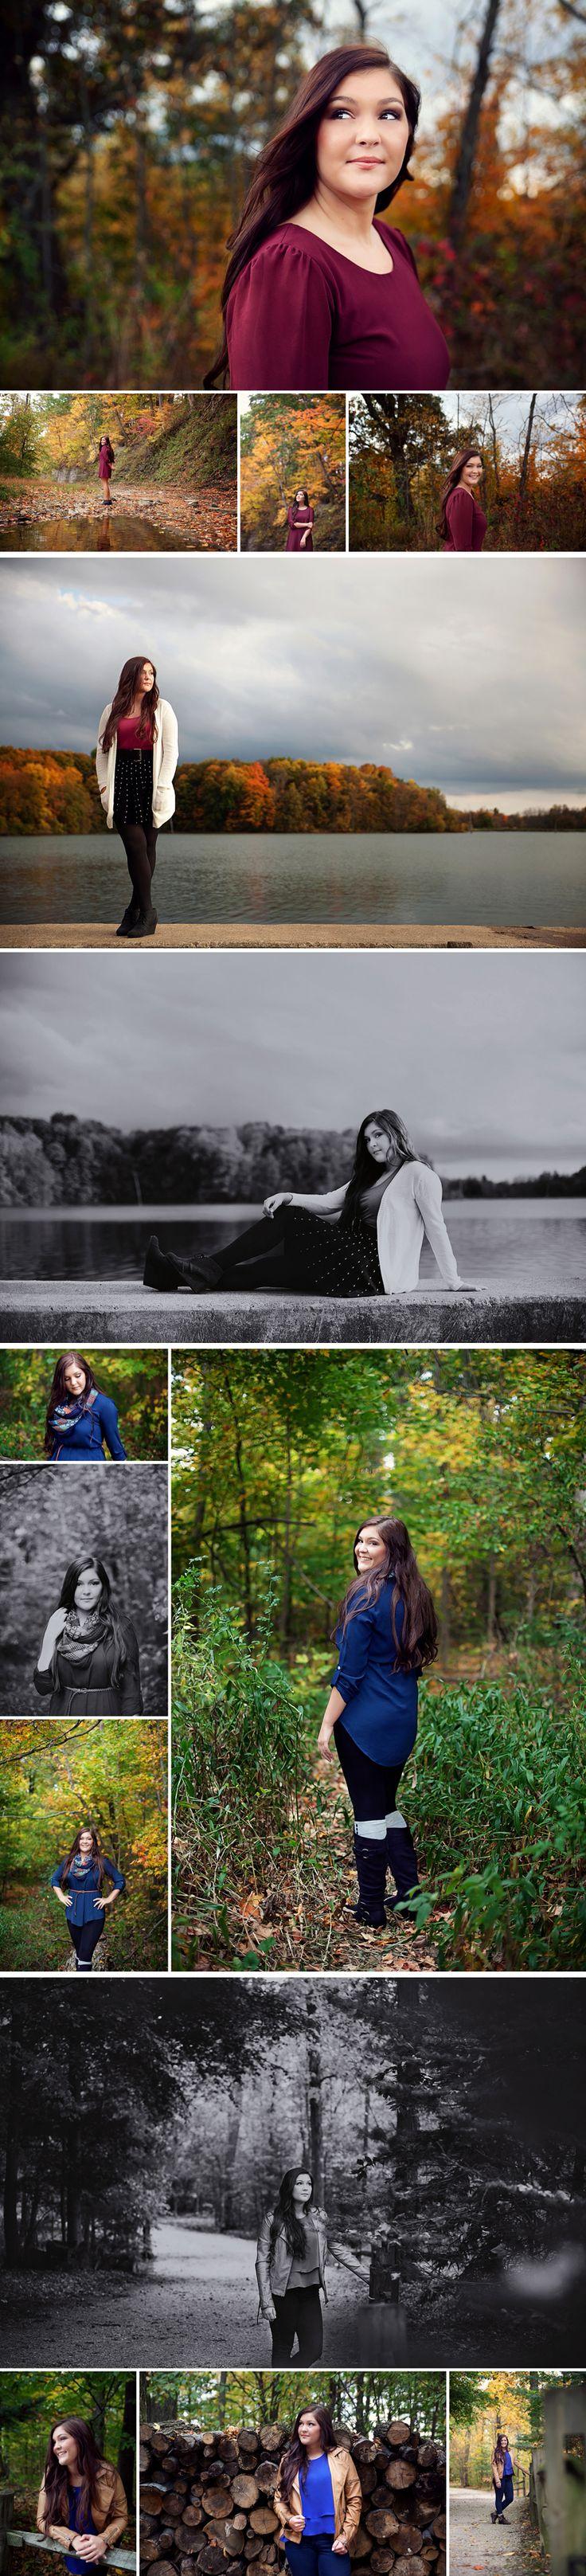 Wooster Ohio Senior Photography - The Picture Show - Norwayne High School Senior Photos